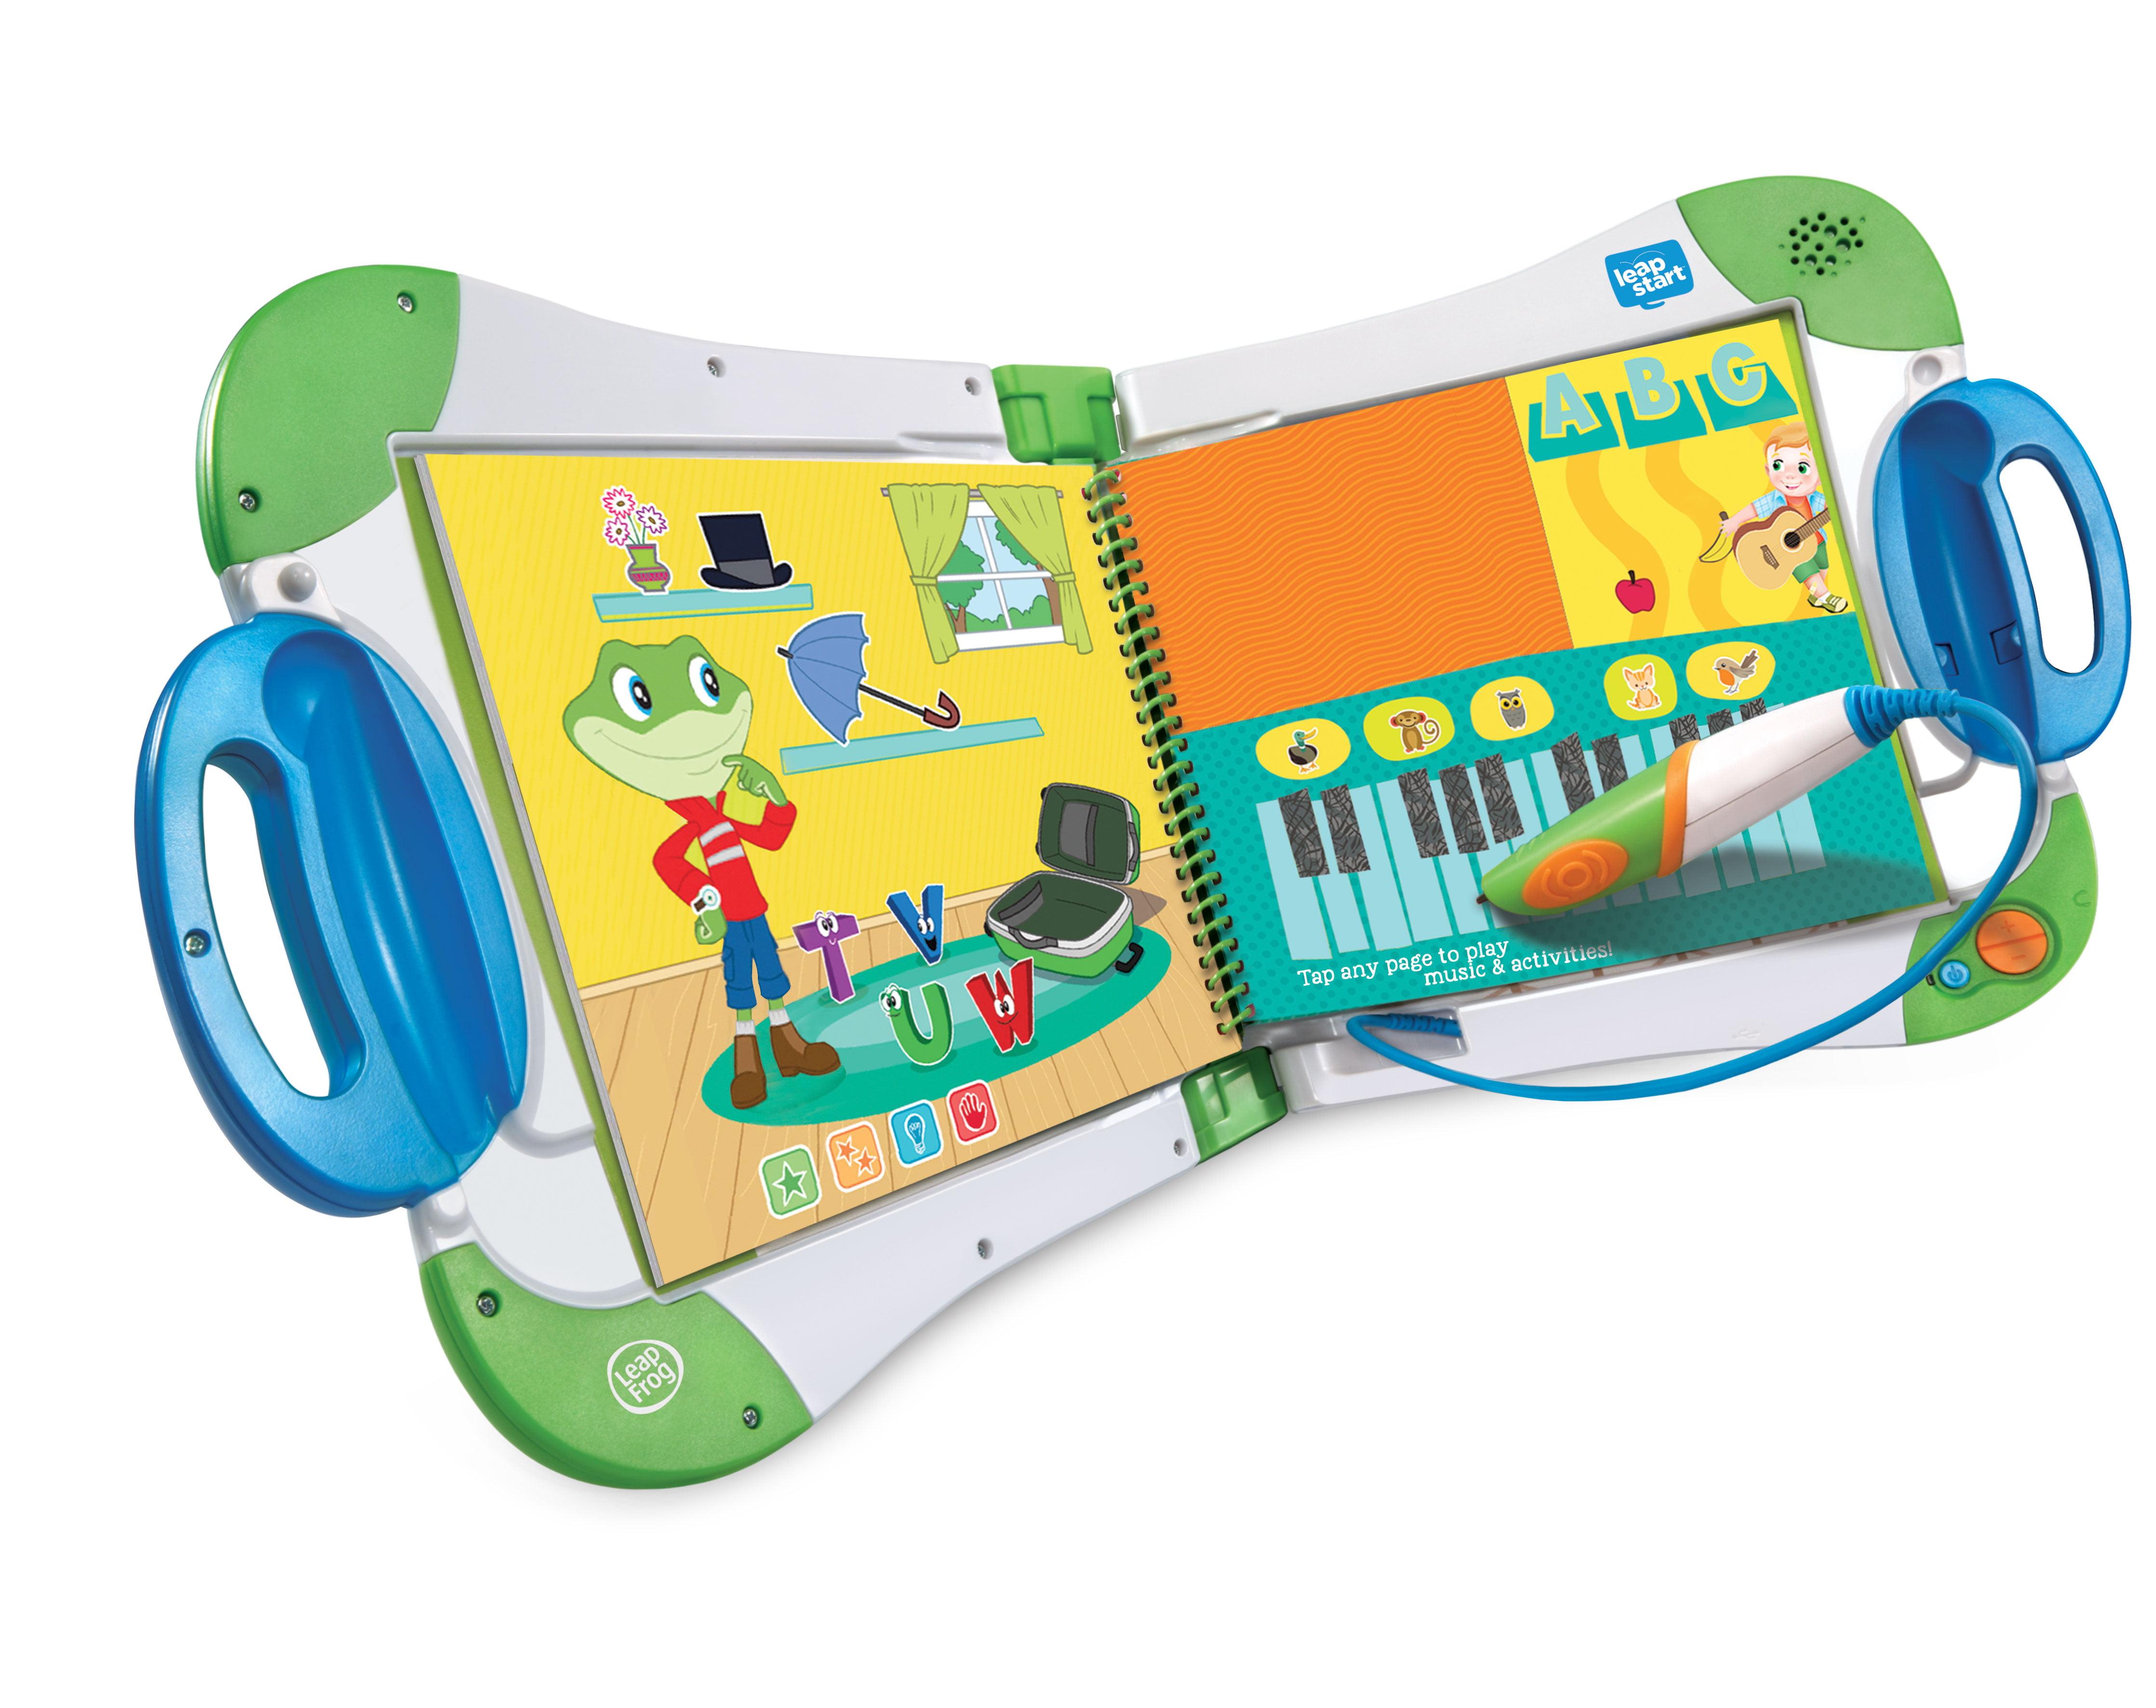 LeapFrog LeapStart Interactive Learning System by LeapFrog